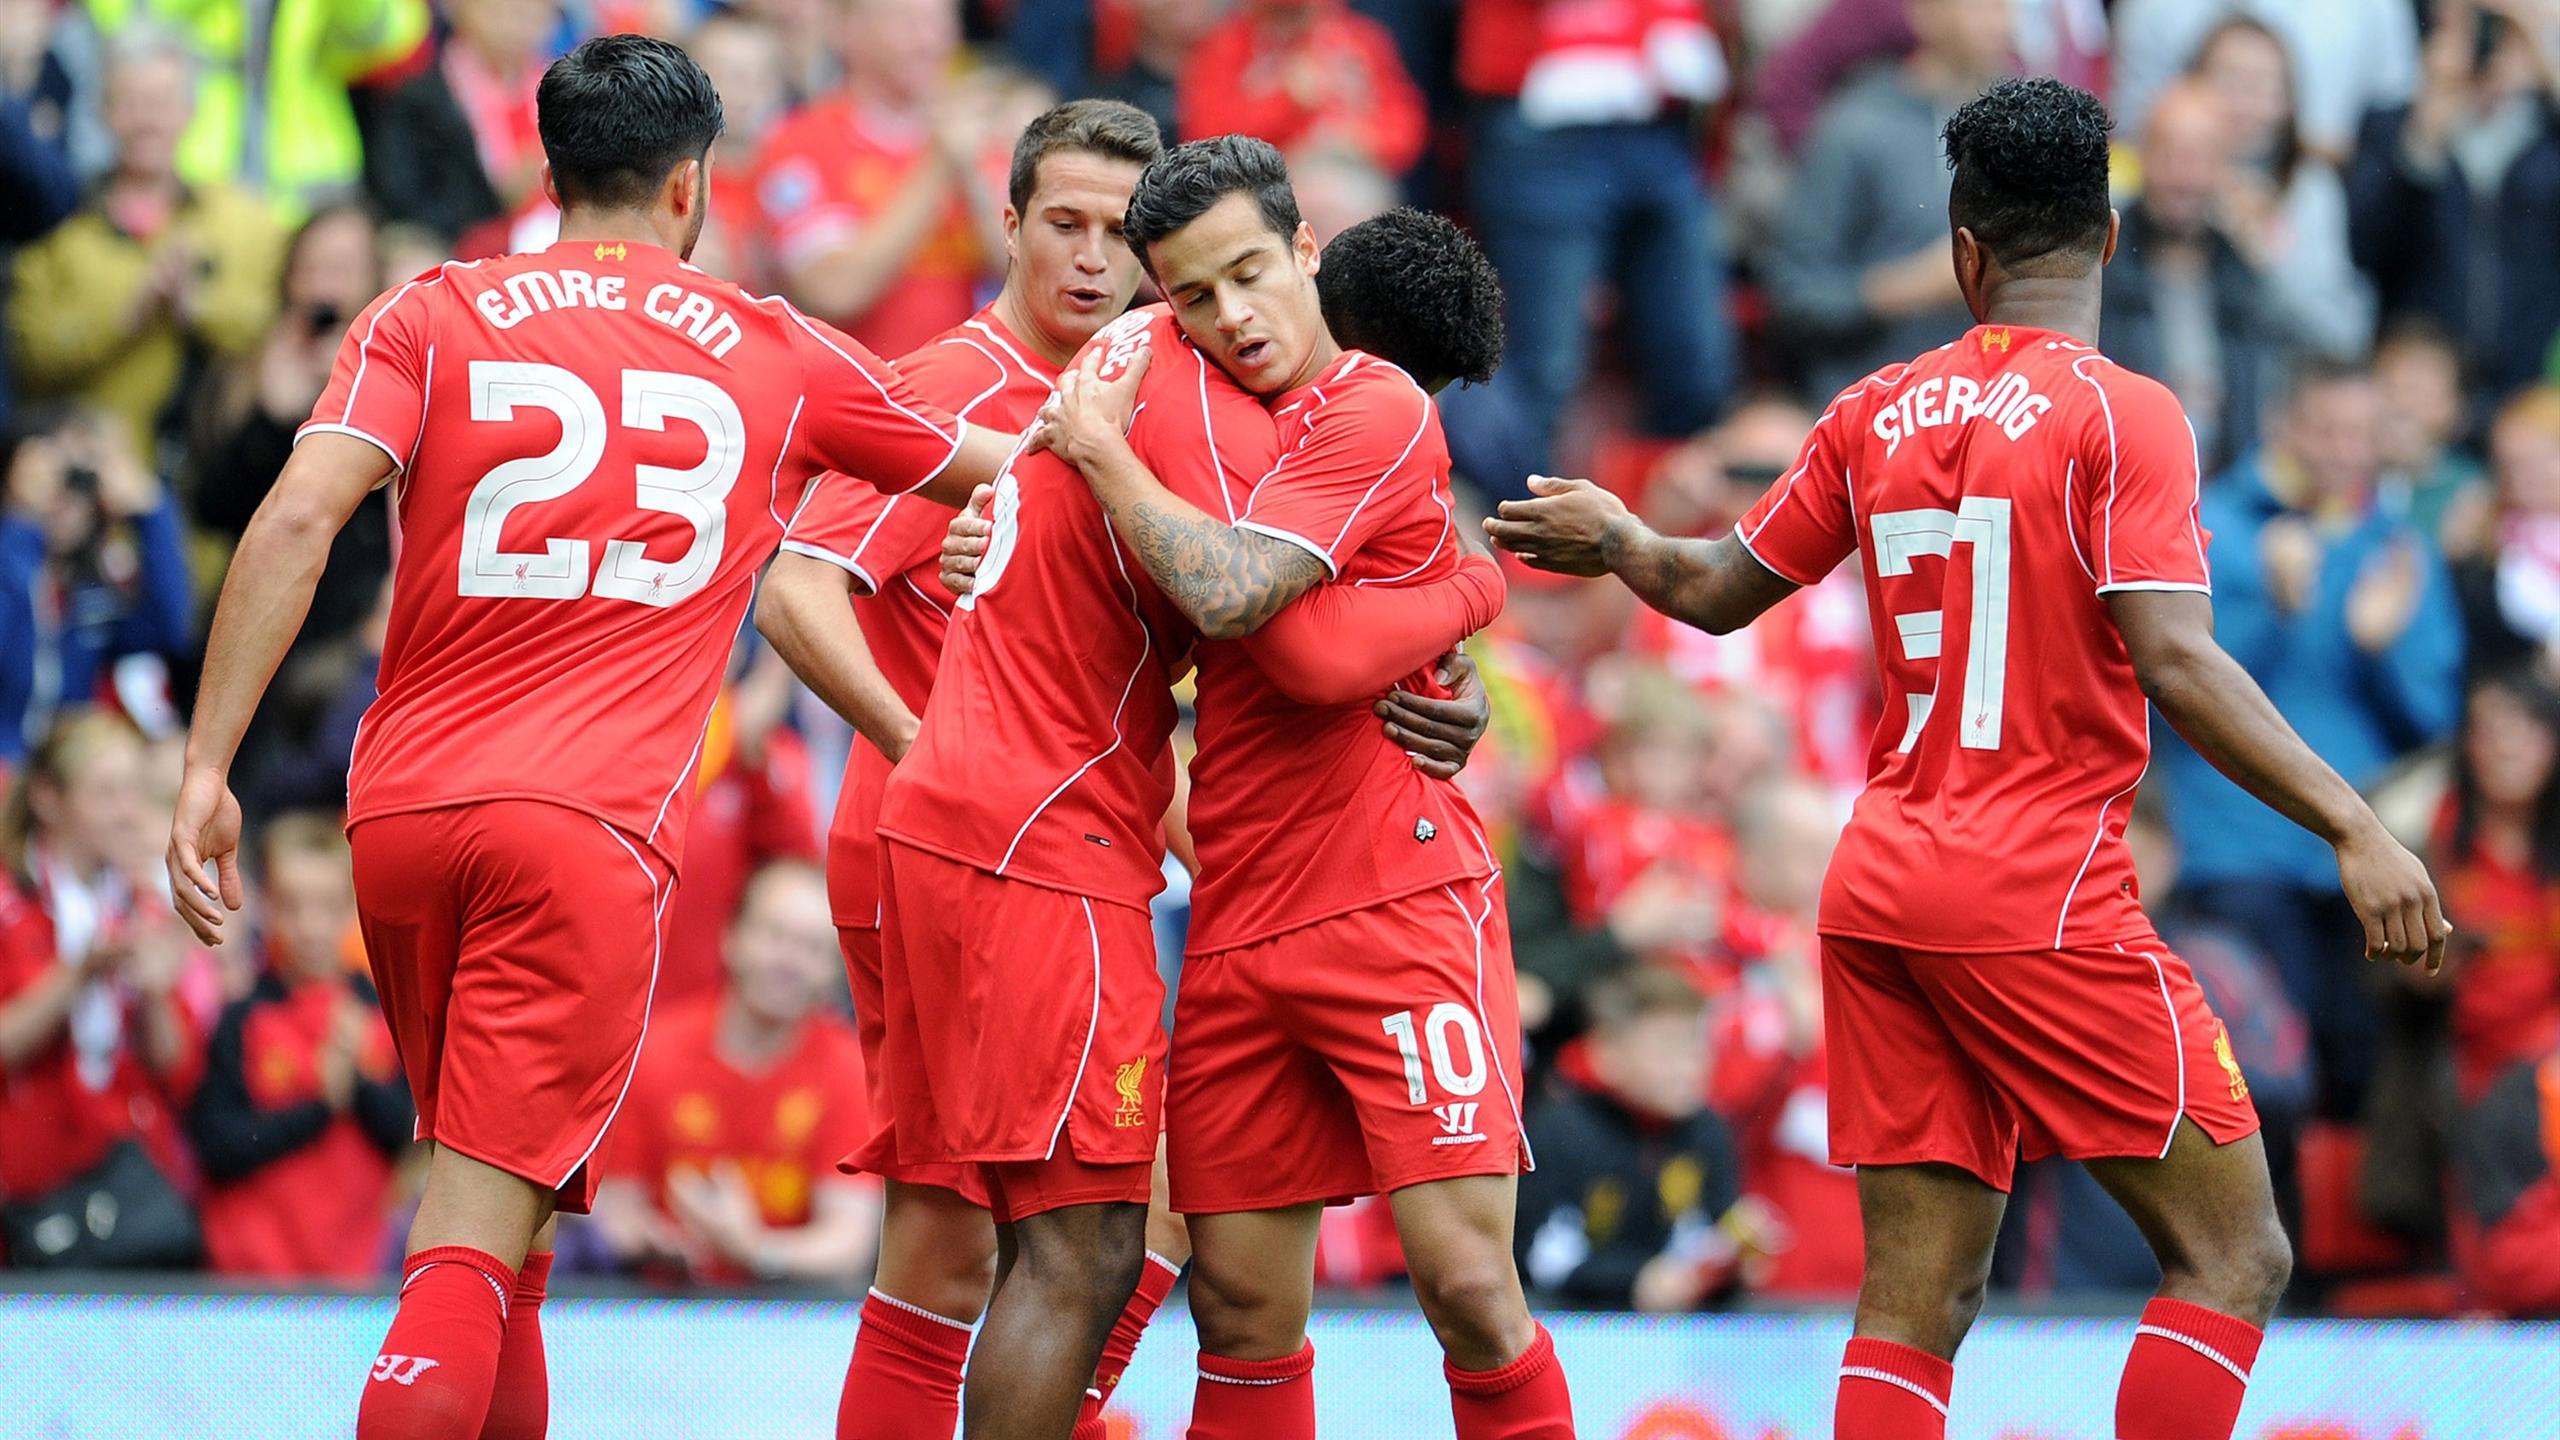 Premier League - Coutinho wonder show as Liverpool demolish Dortmund